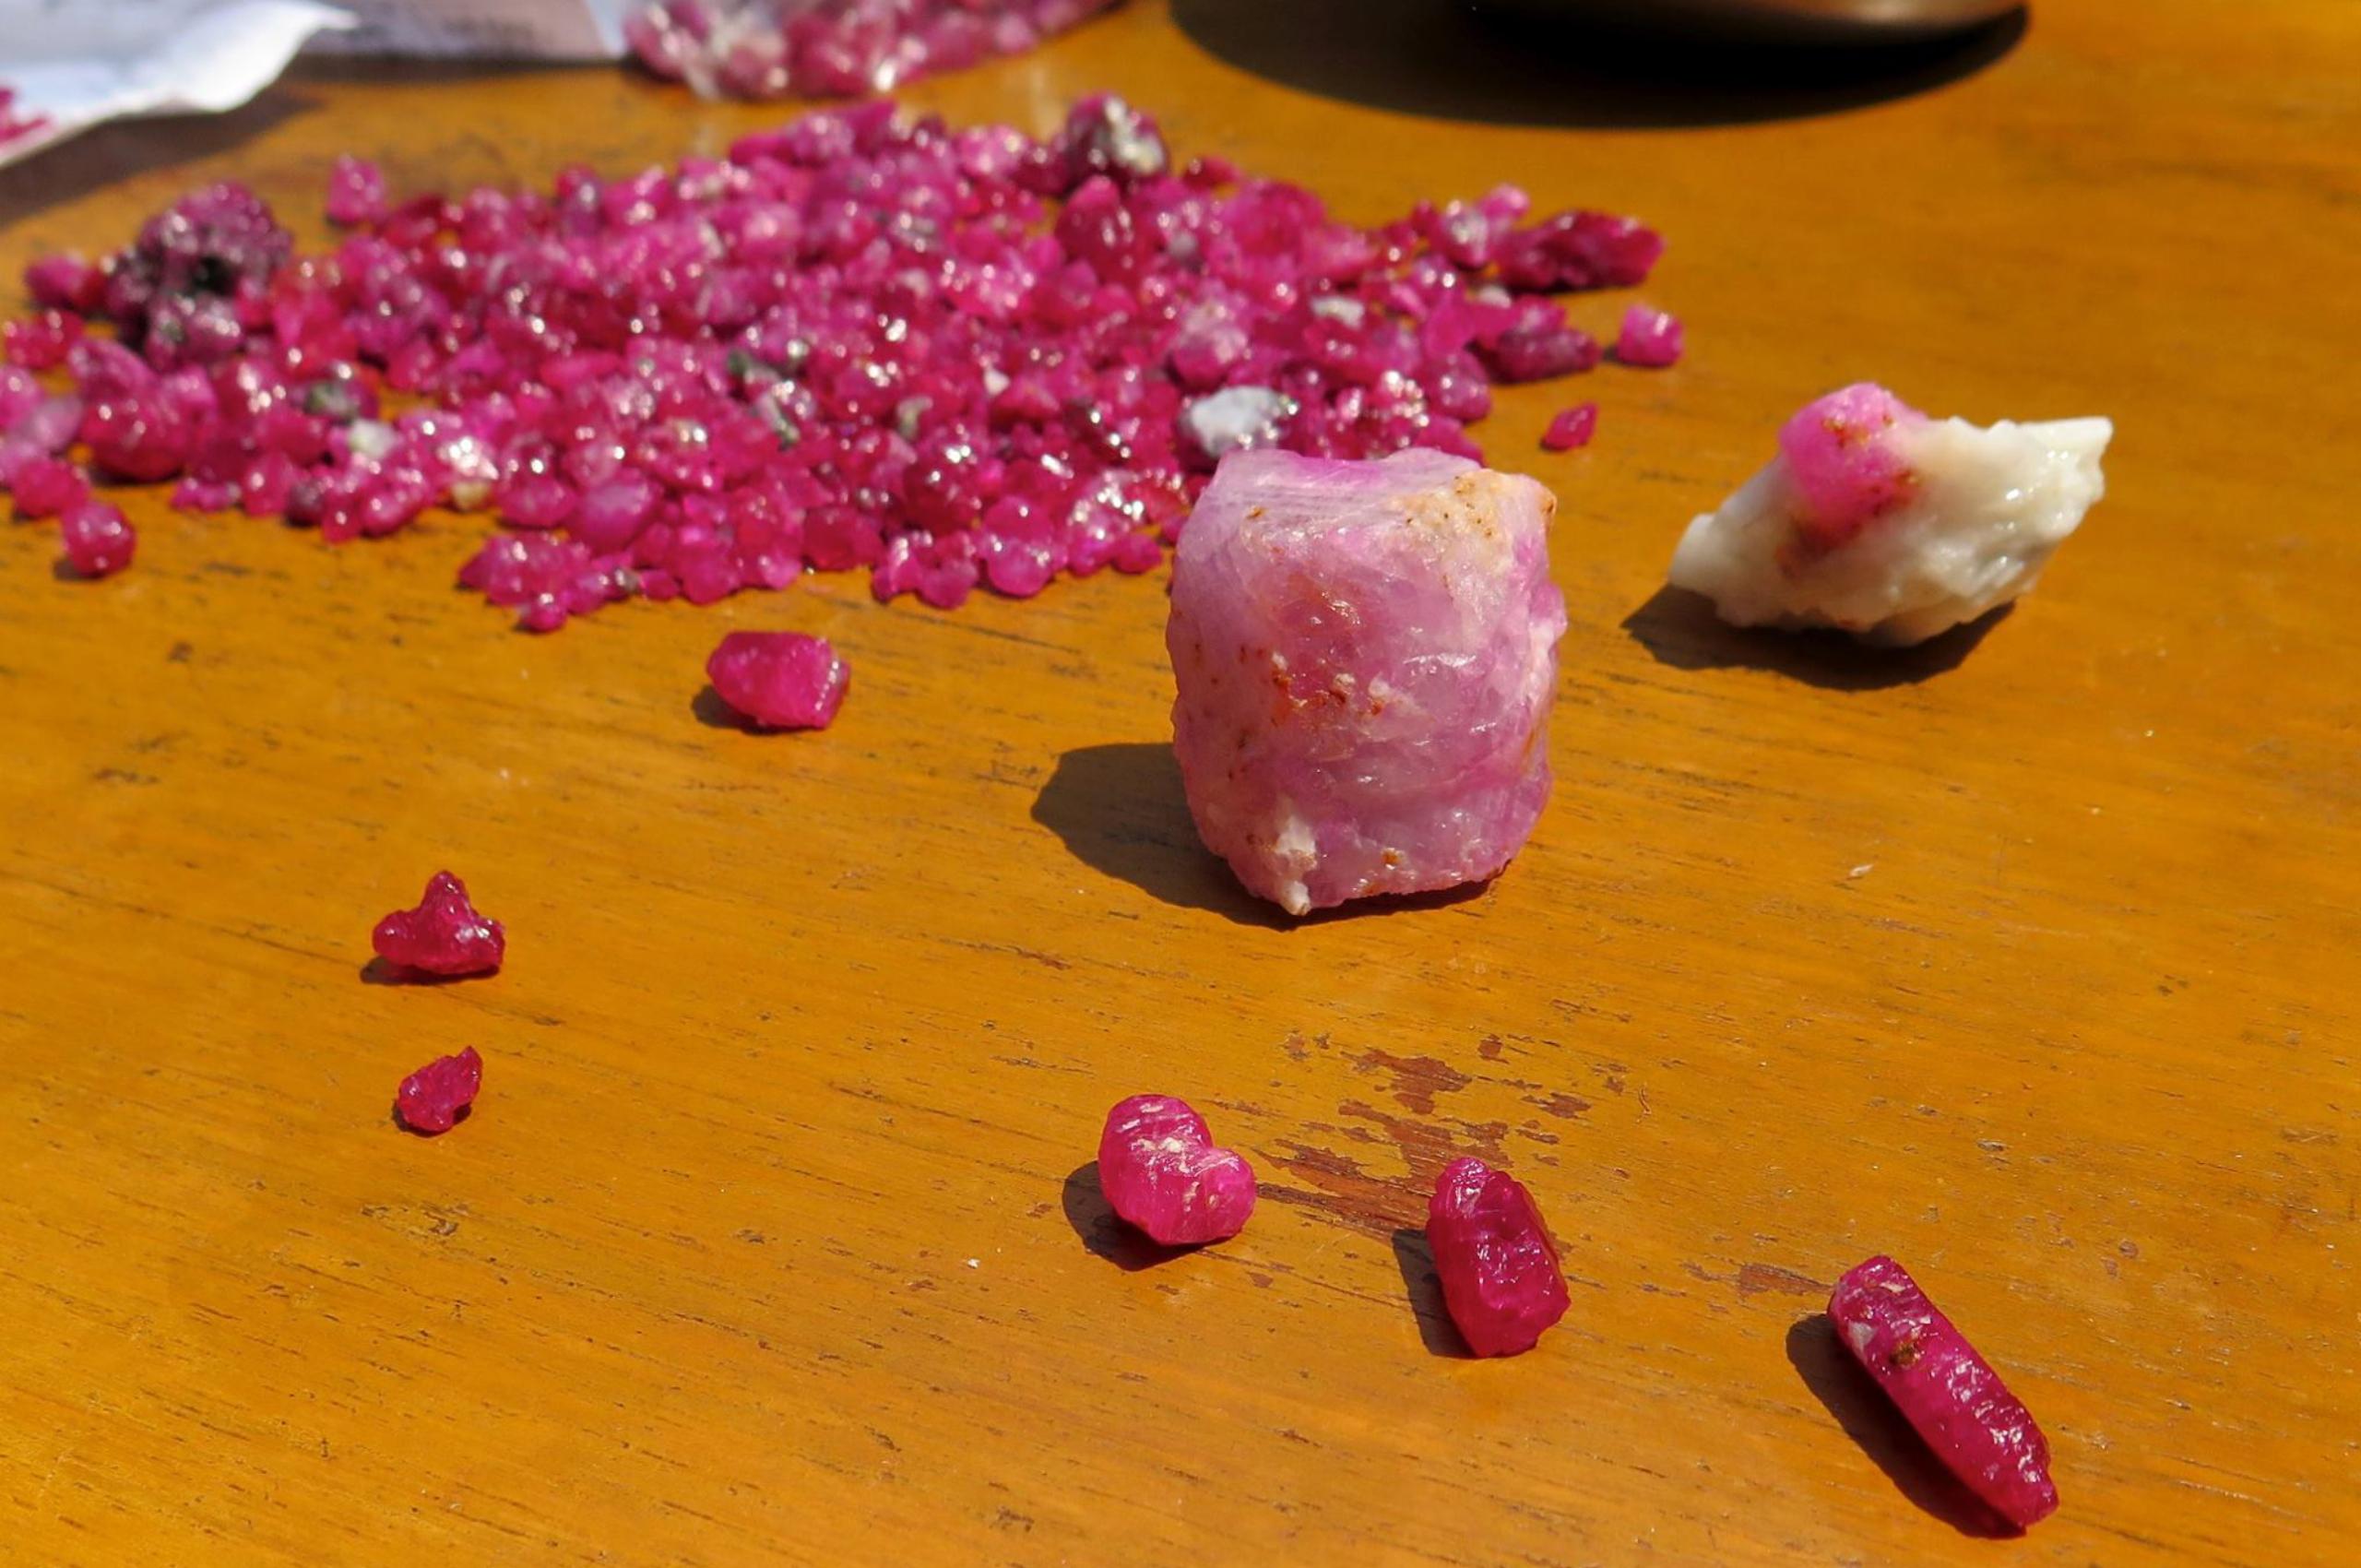 Rubies-from-Mogok.-Photo-by-Federico-Barlocher